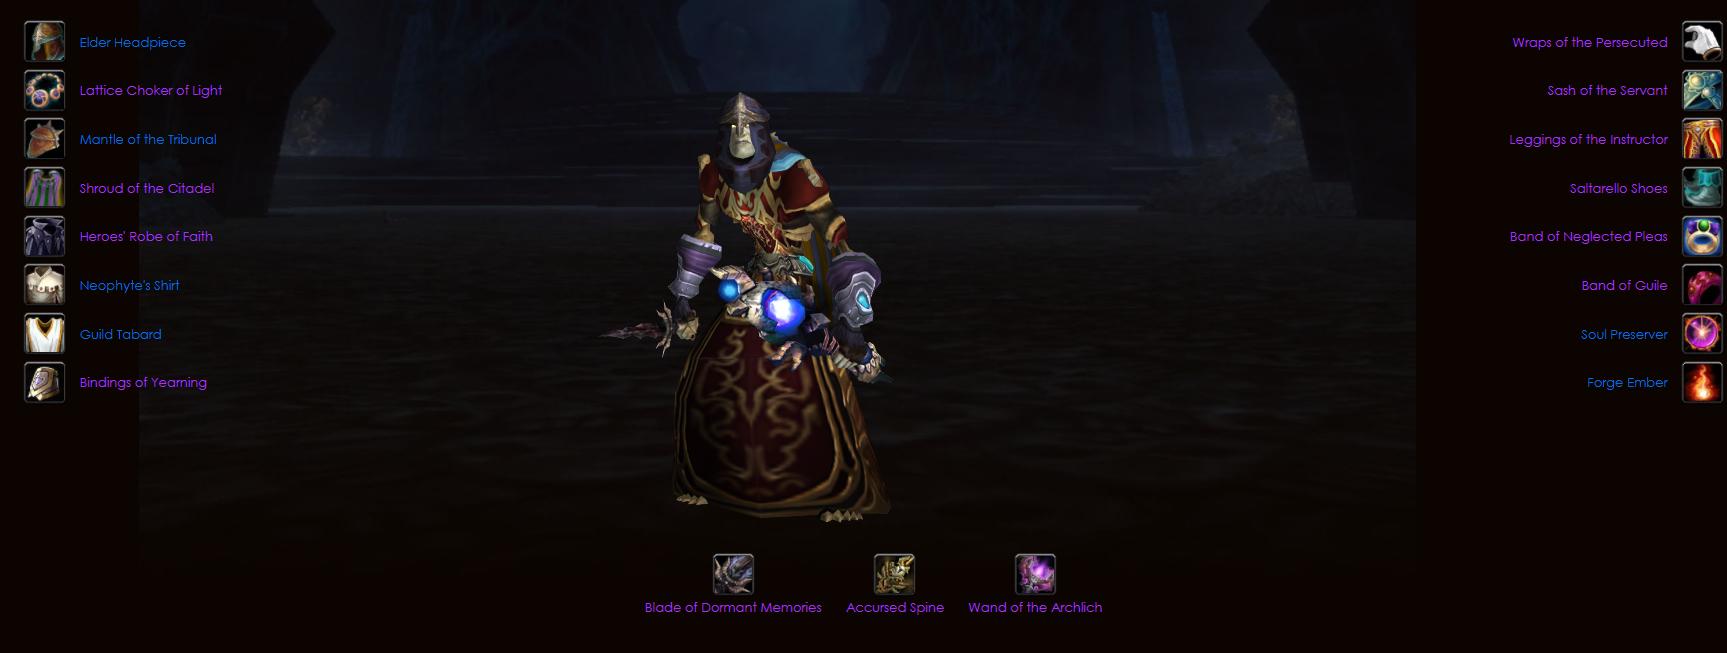 Undead male priest voltarus